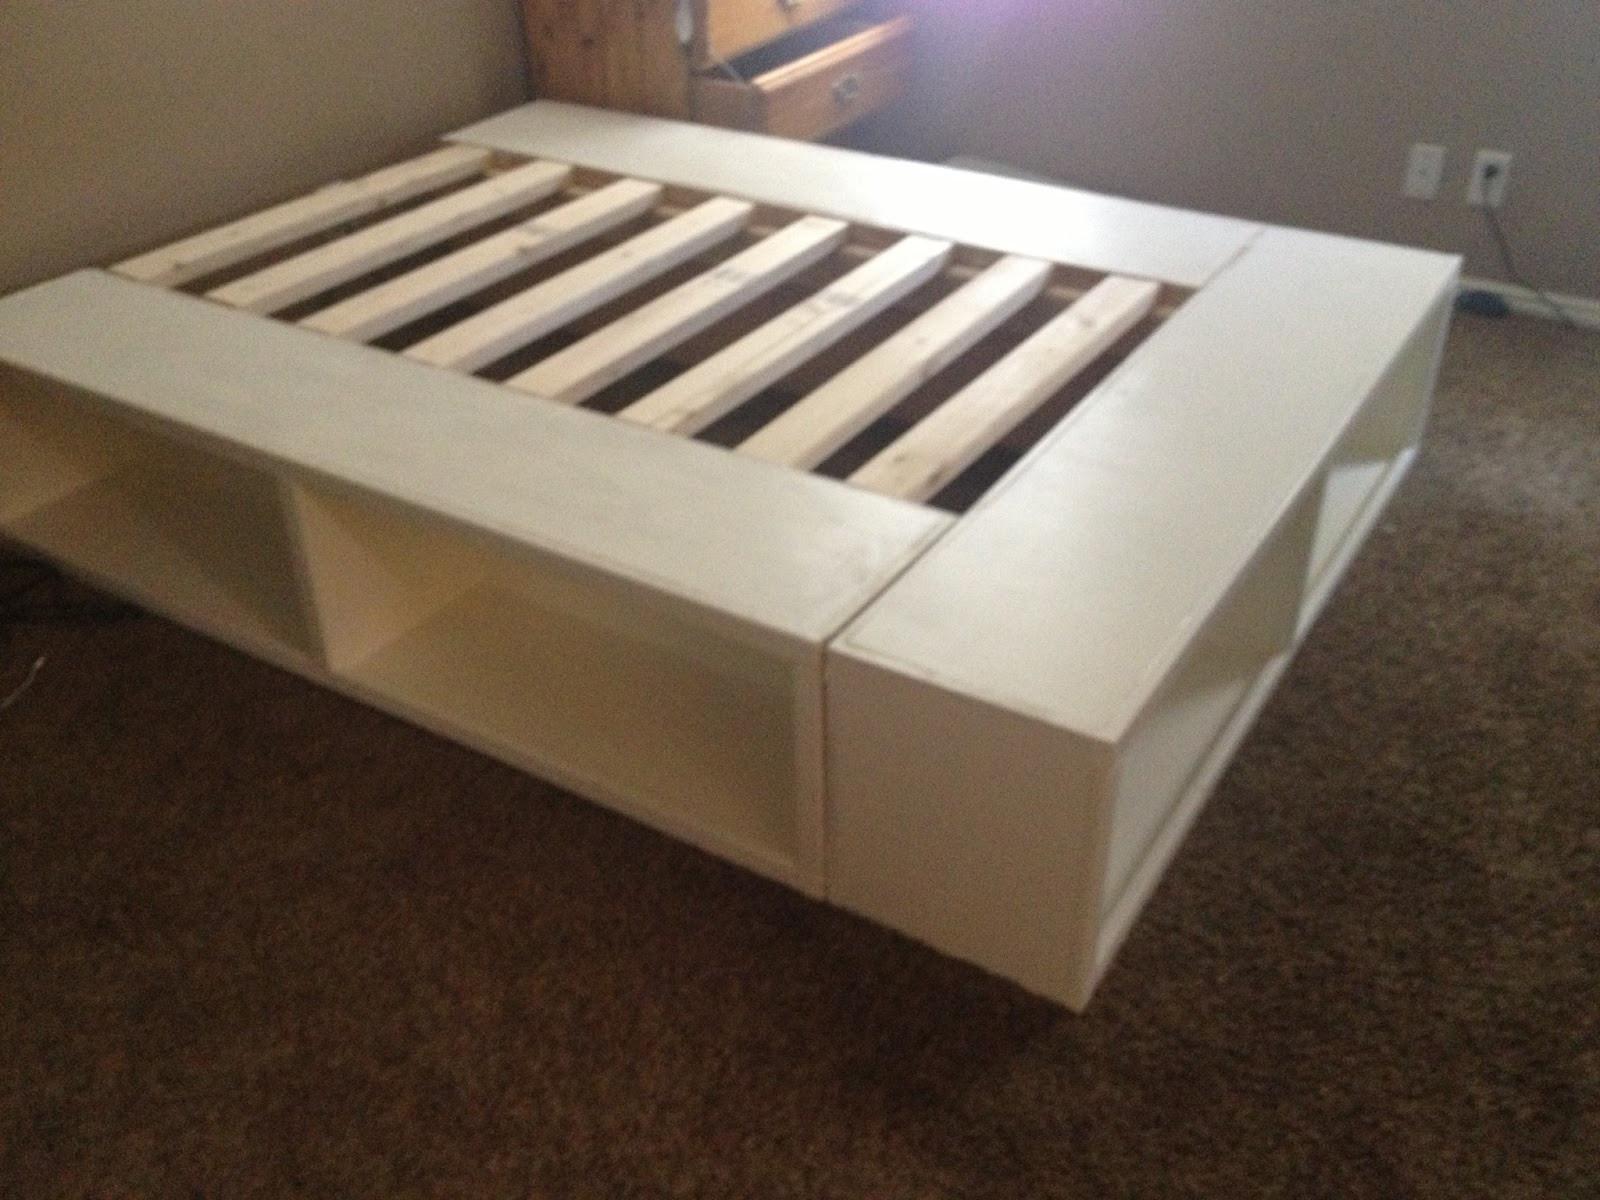 DIY Wooden Bed Frame With Storage  DIY Storage Bed